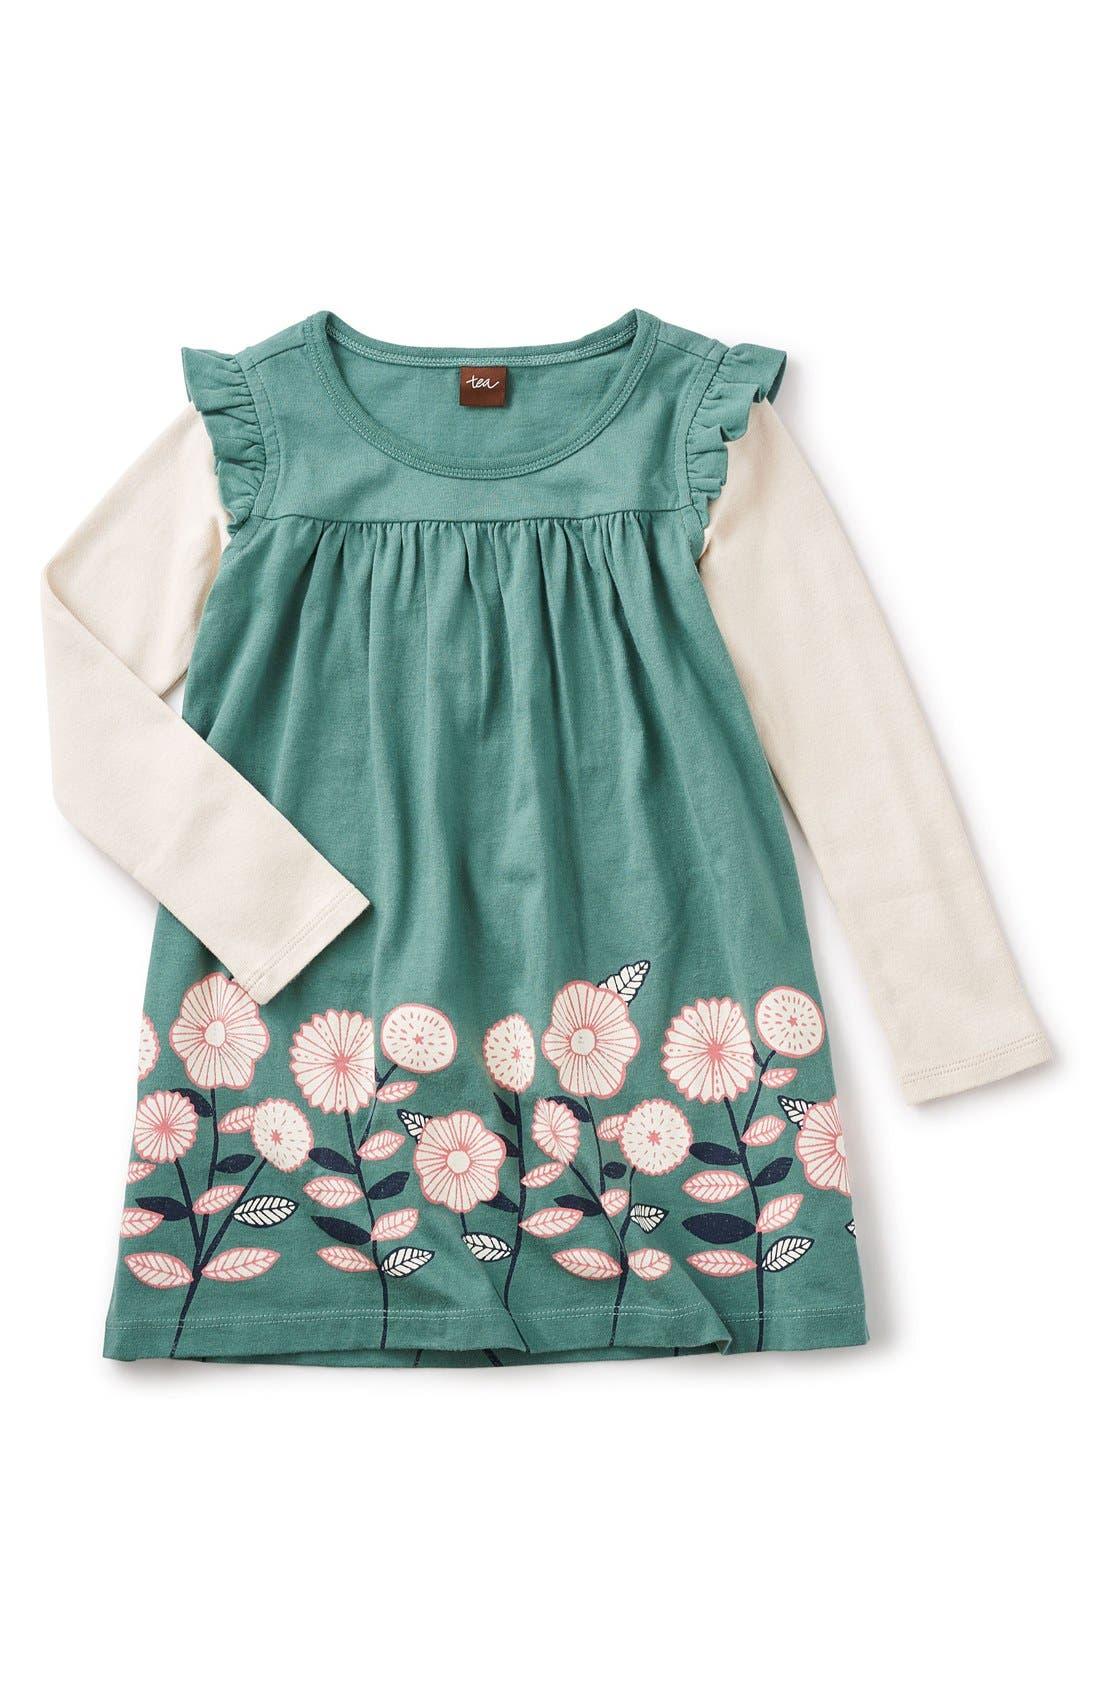 Alternate Image 1 Selected - Tea Collection 'Midori - Double Decker' Layered Dress (Toddler Girls, Little Girls & Big Girls)